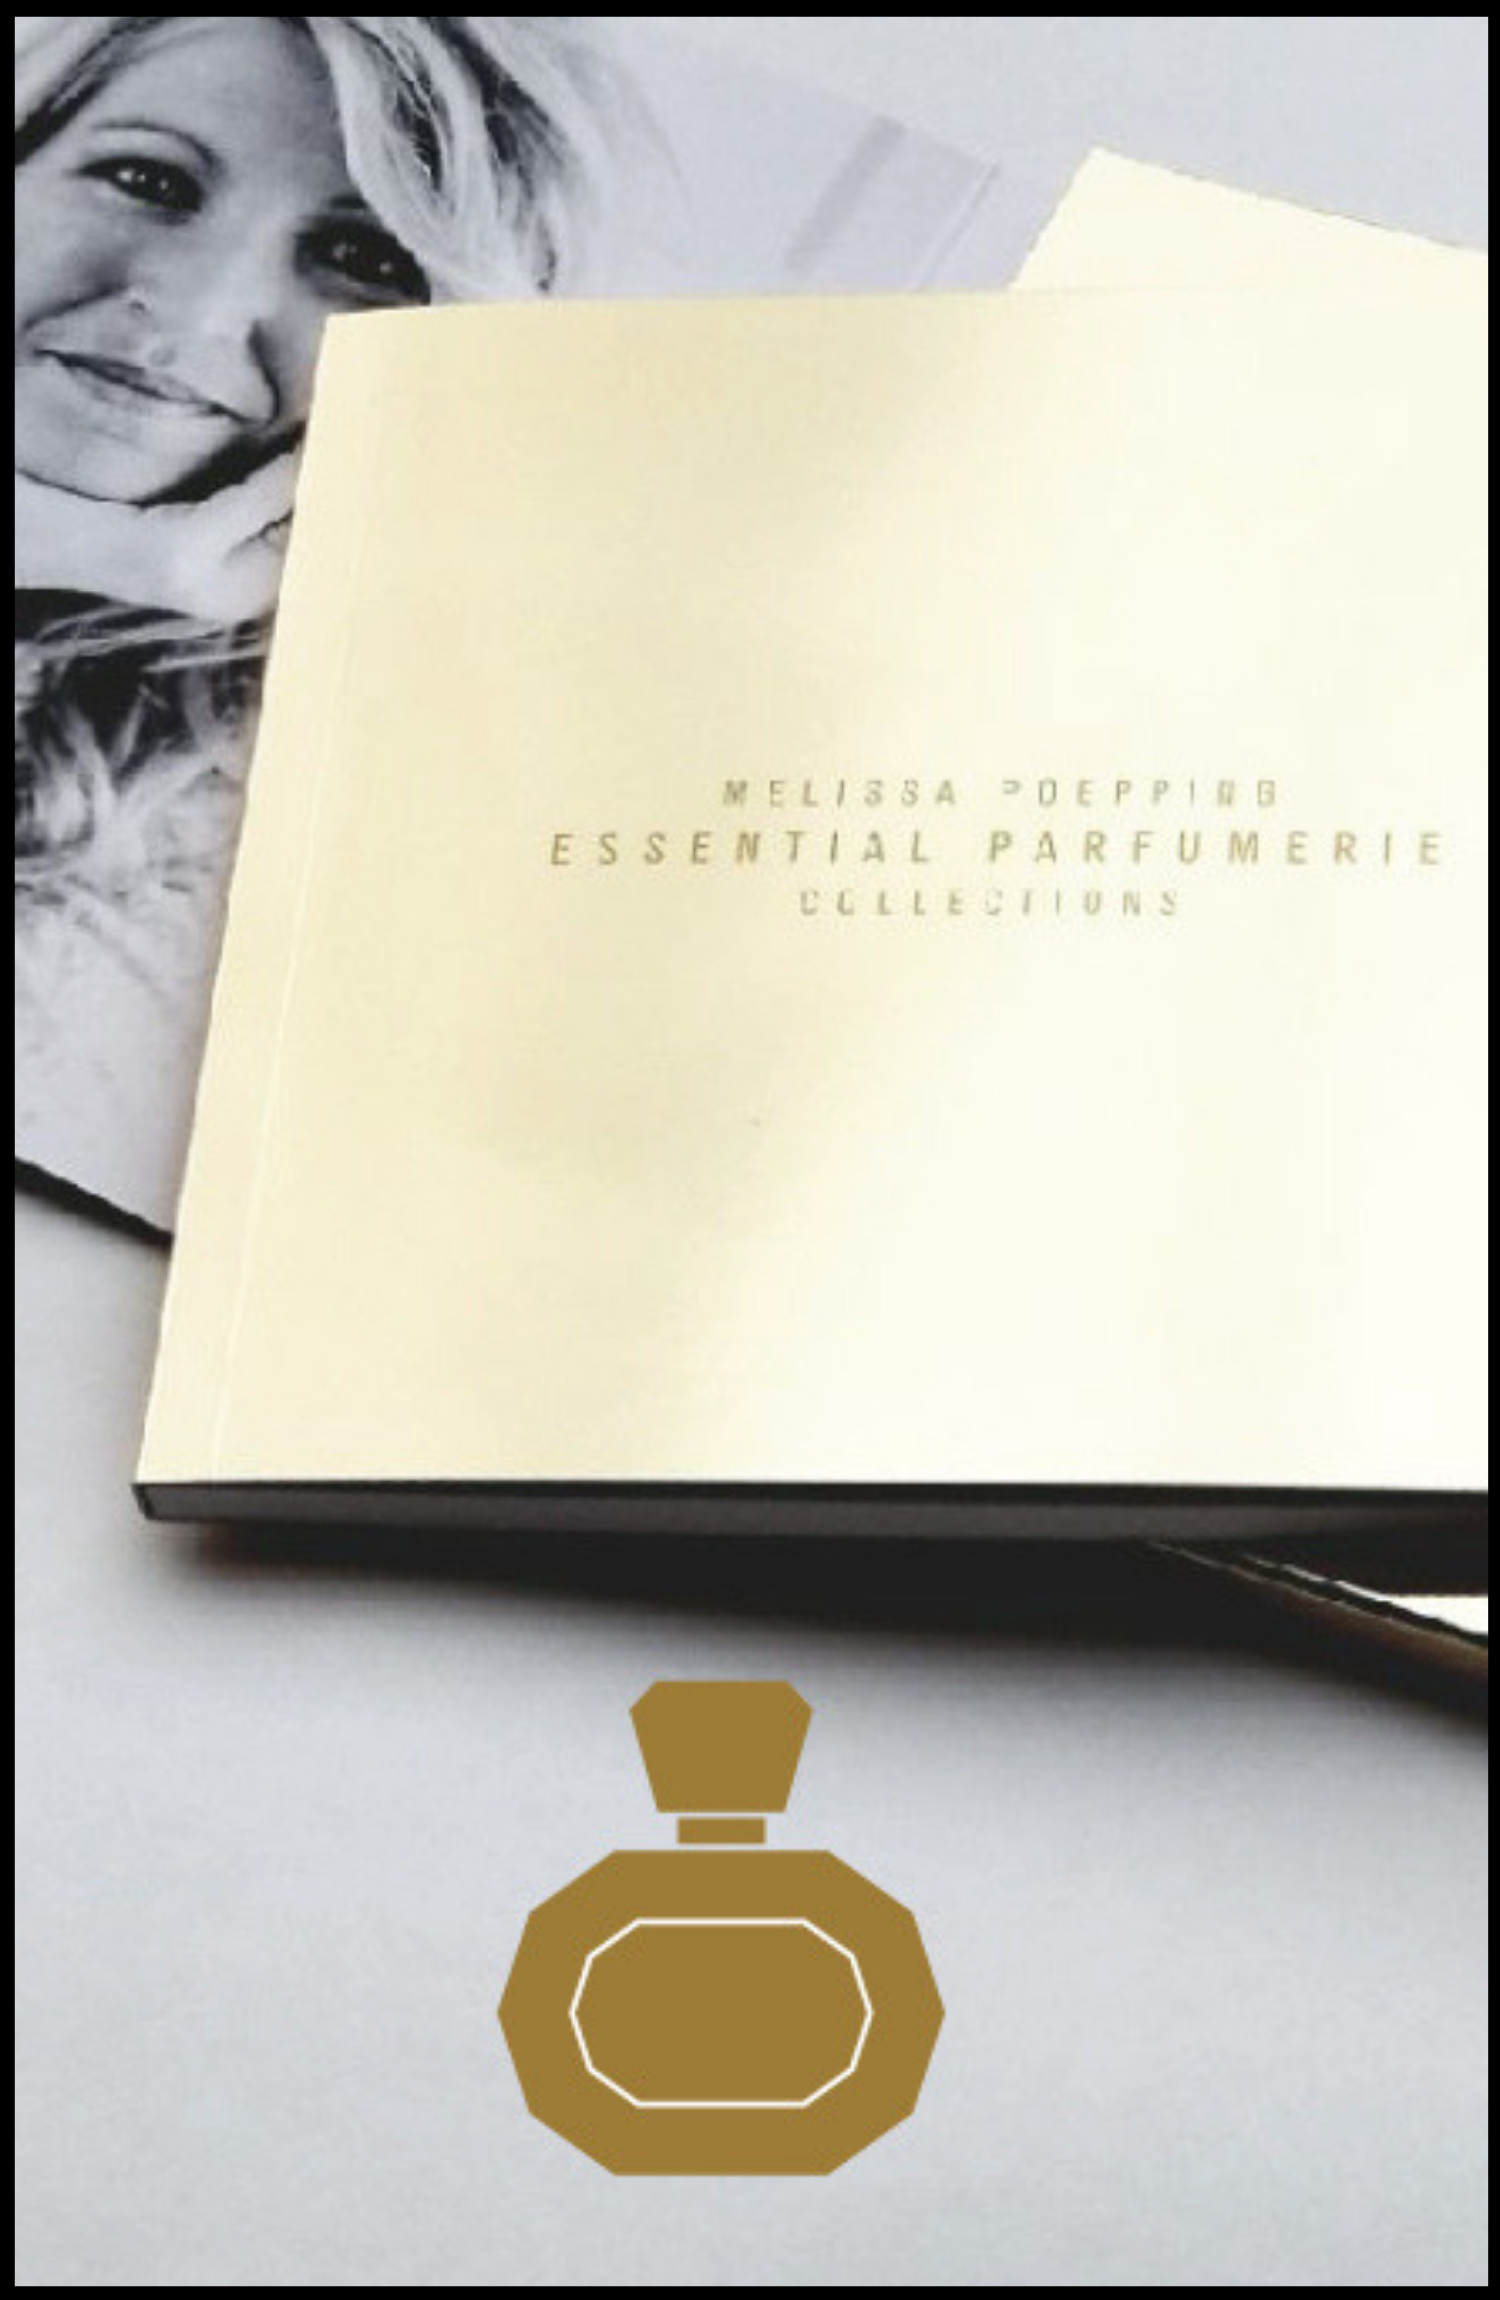 Essential Parfumerie